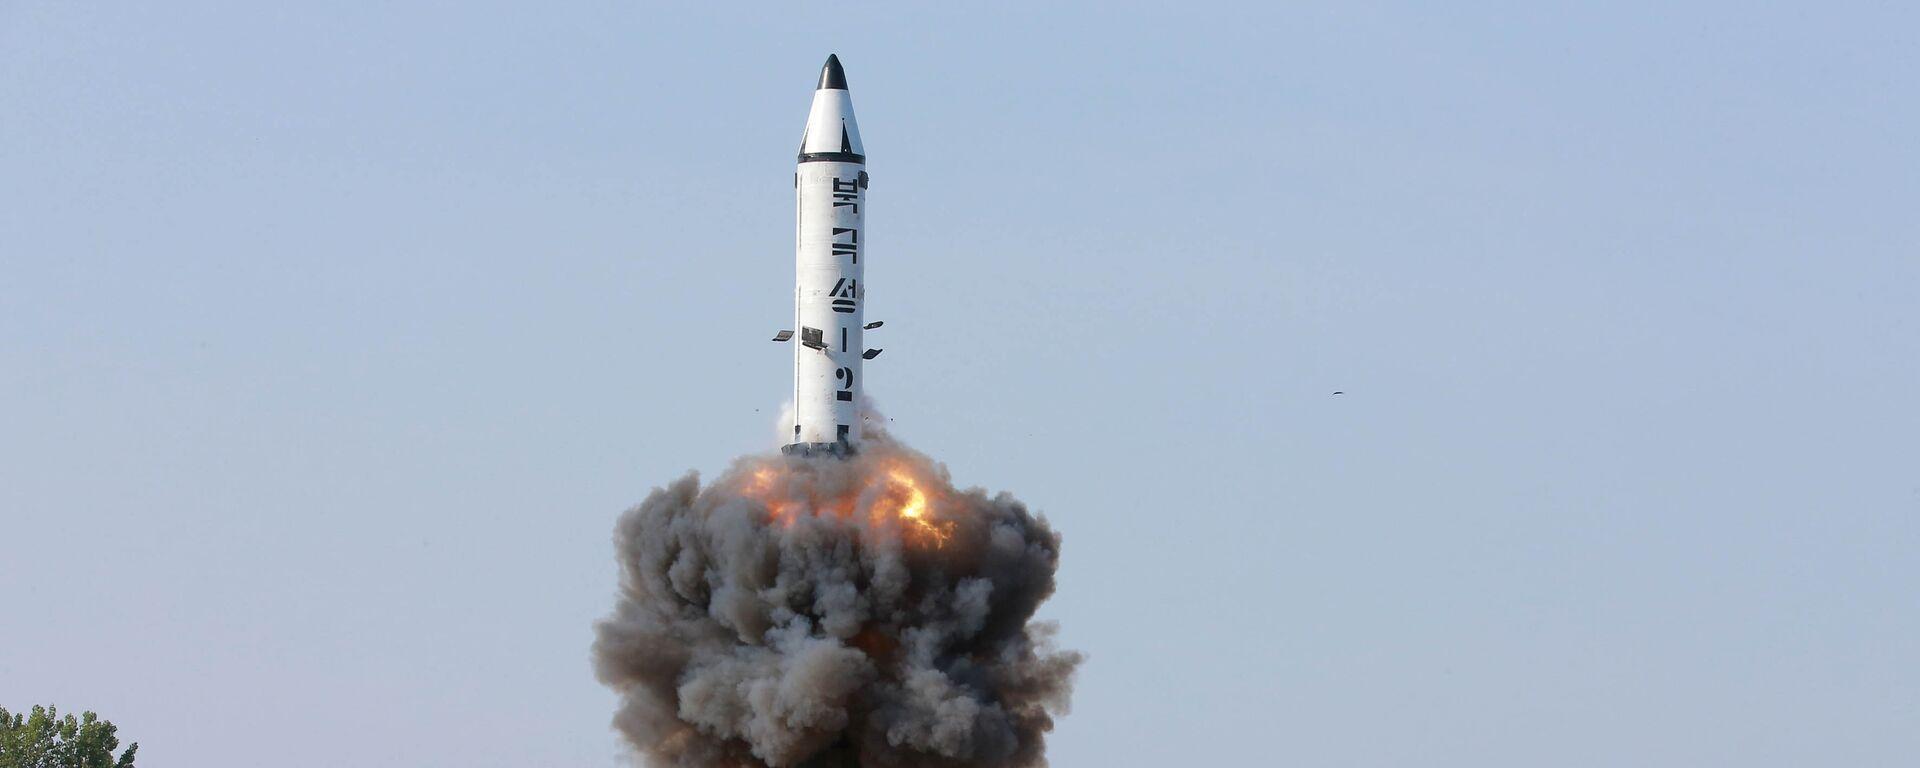 Corea del Norte lanza misil balístico - Sputnik Mundo, 1920, 15.09.2021